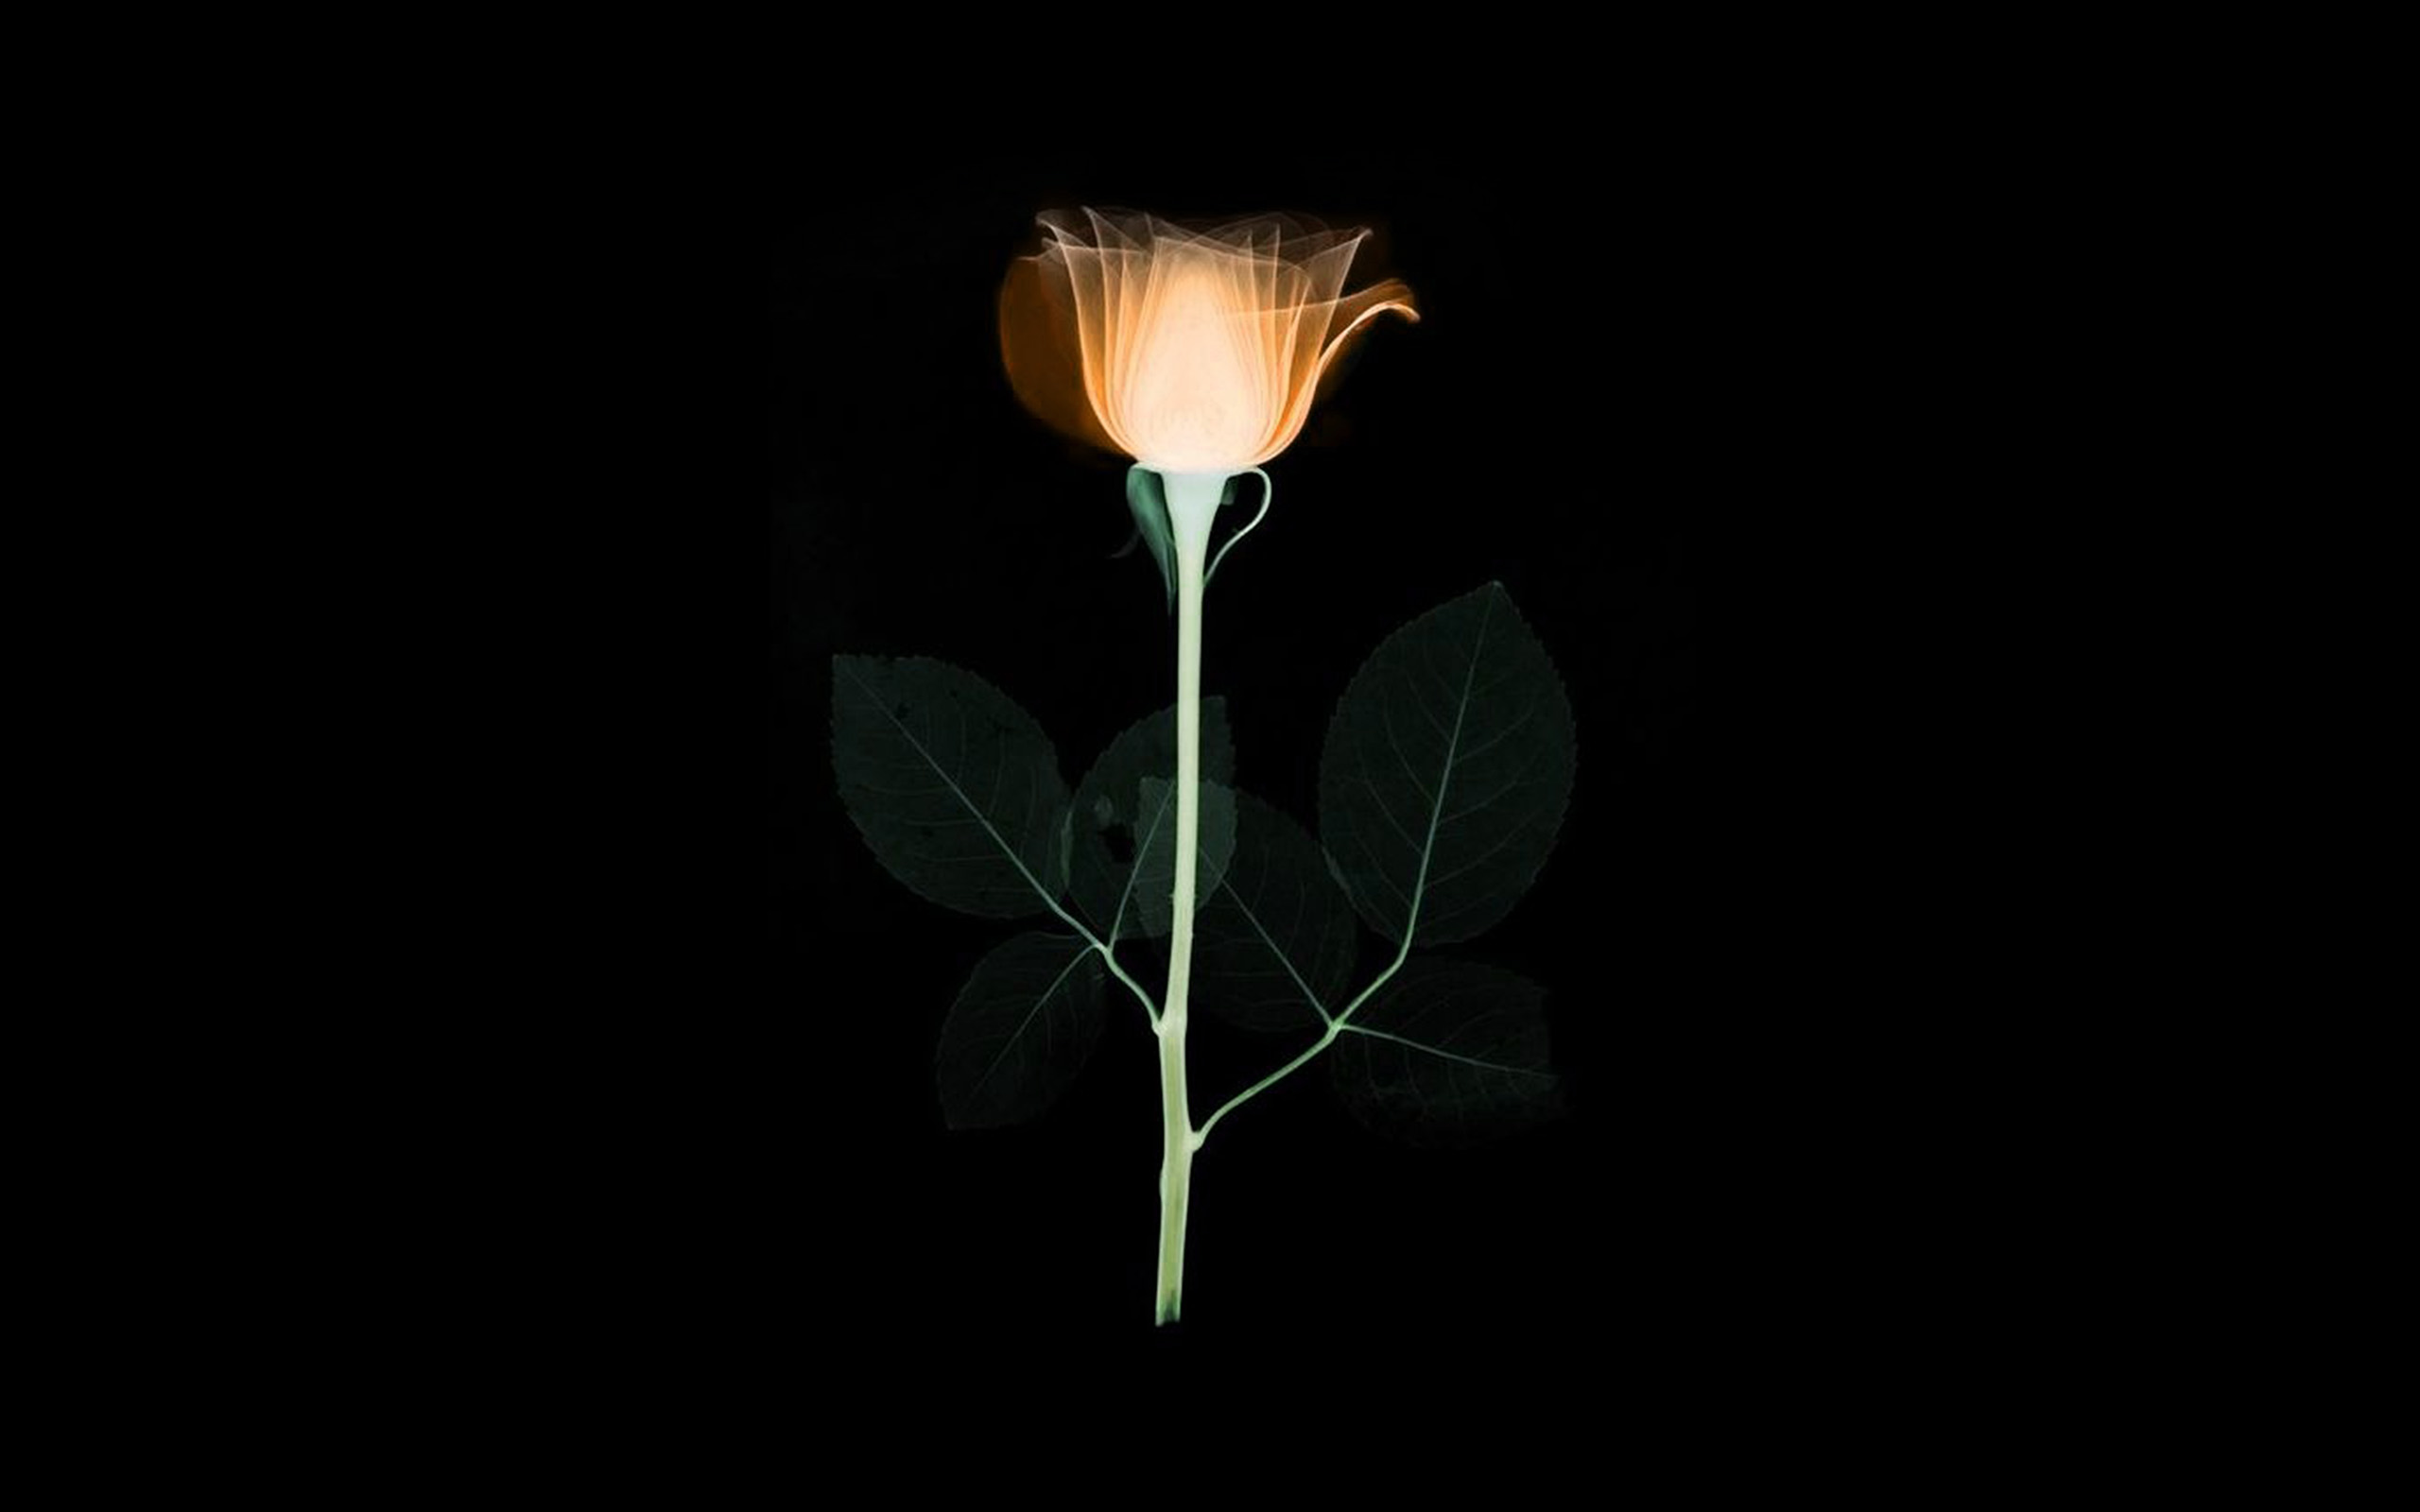 Iphone 8 Plus X Ray Wallpaper At75 Flower Xray Simple Minimal Orange Rose Dark Art